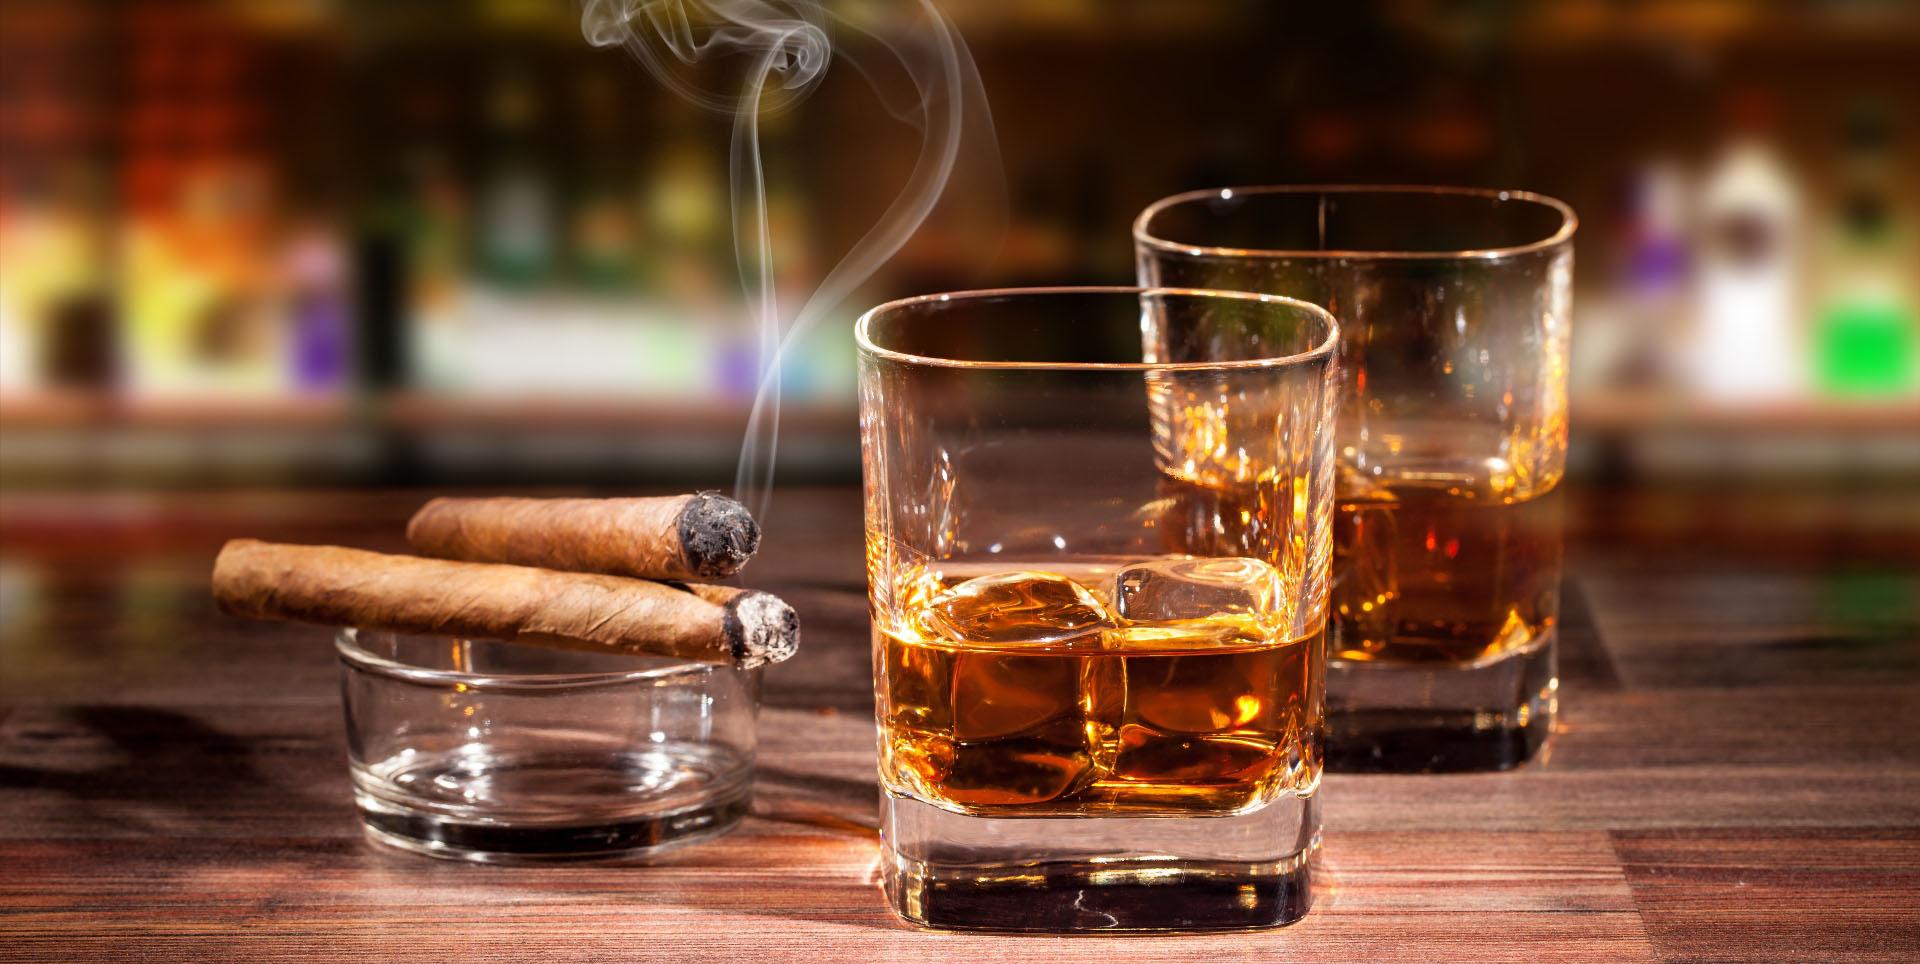 خطرات مصرف الکل